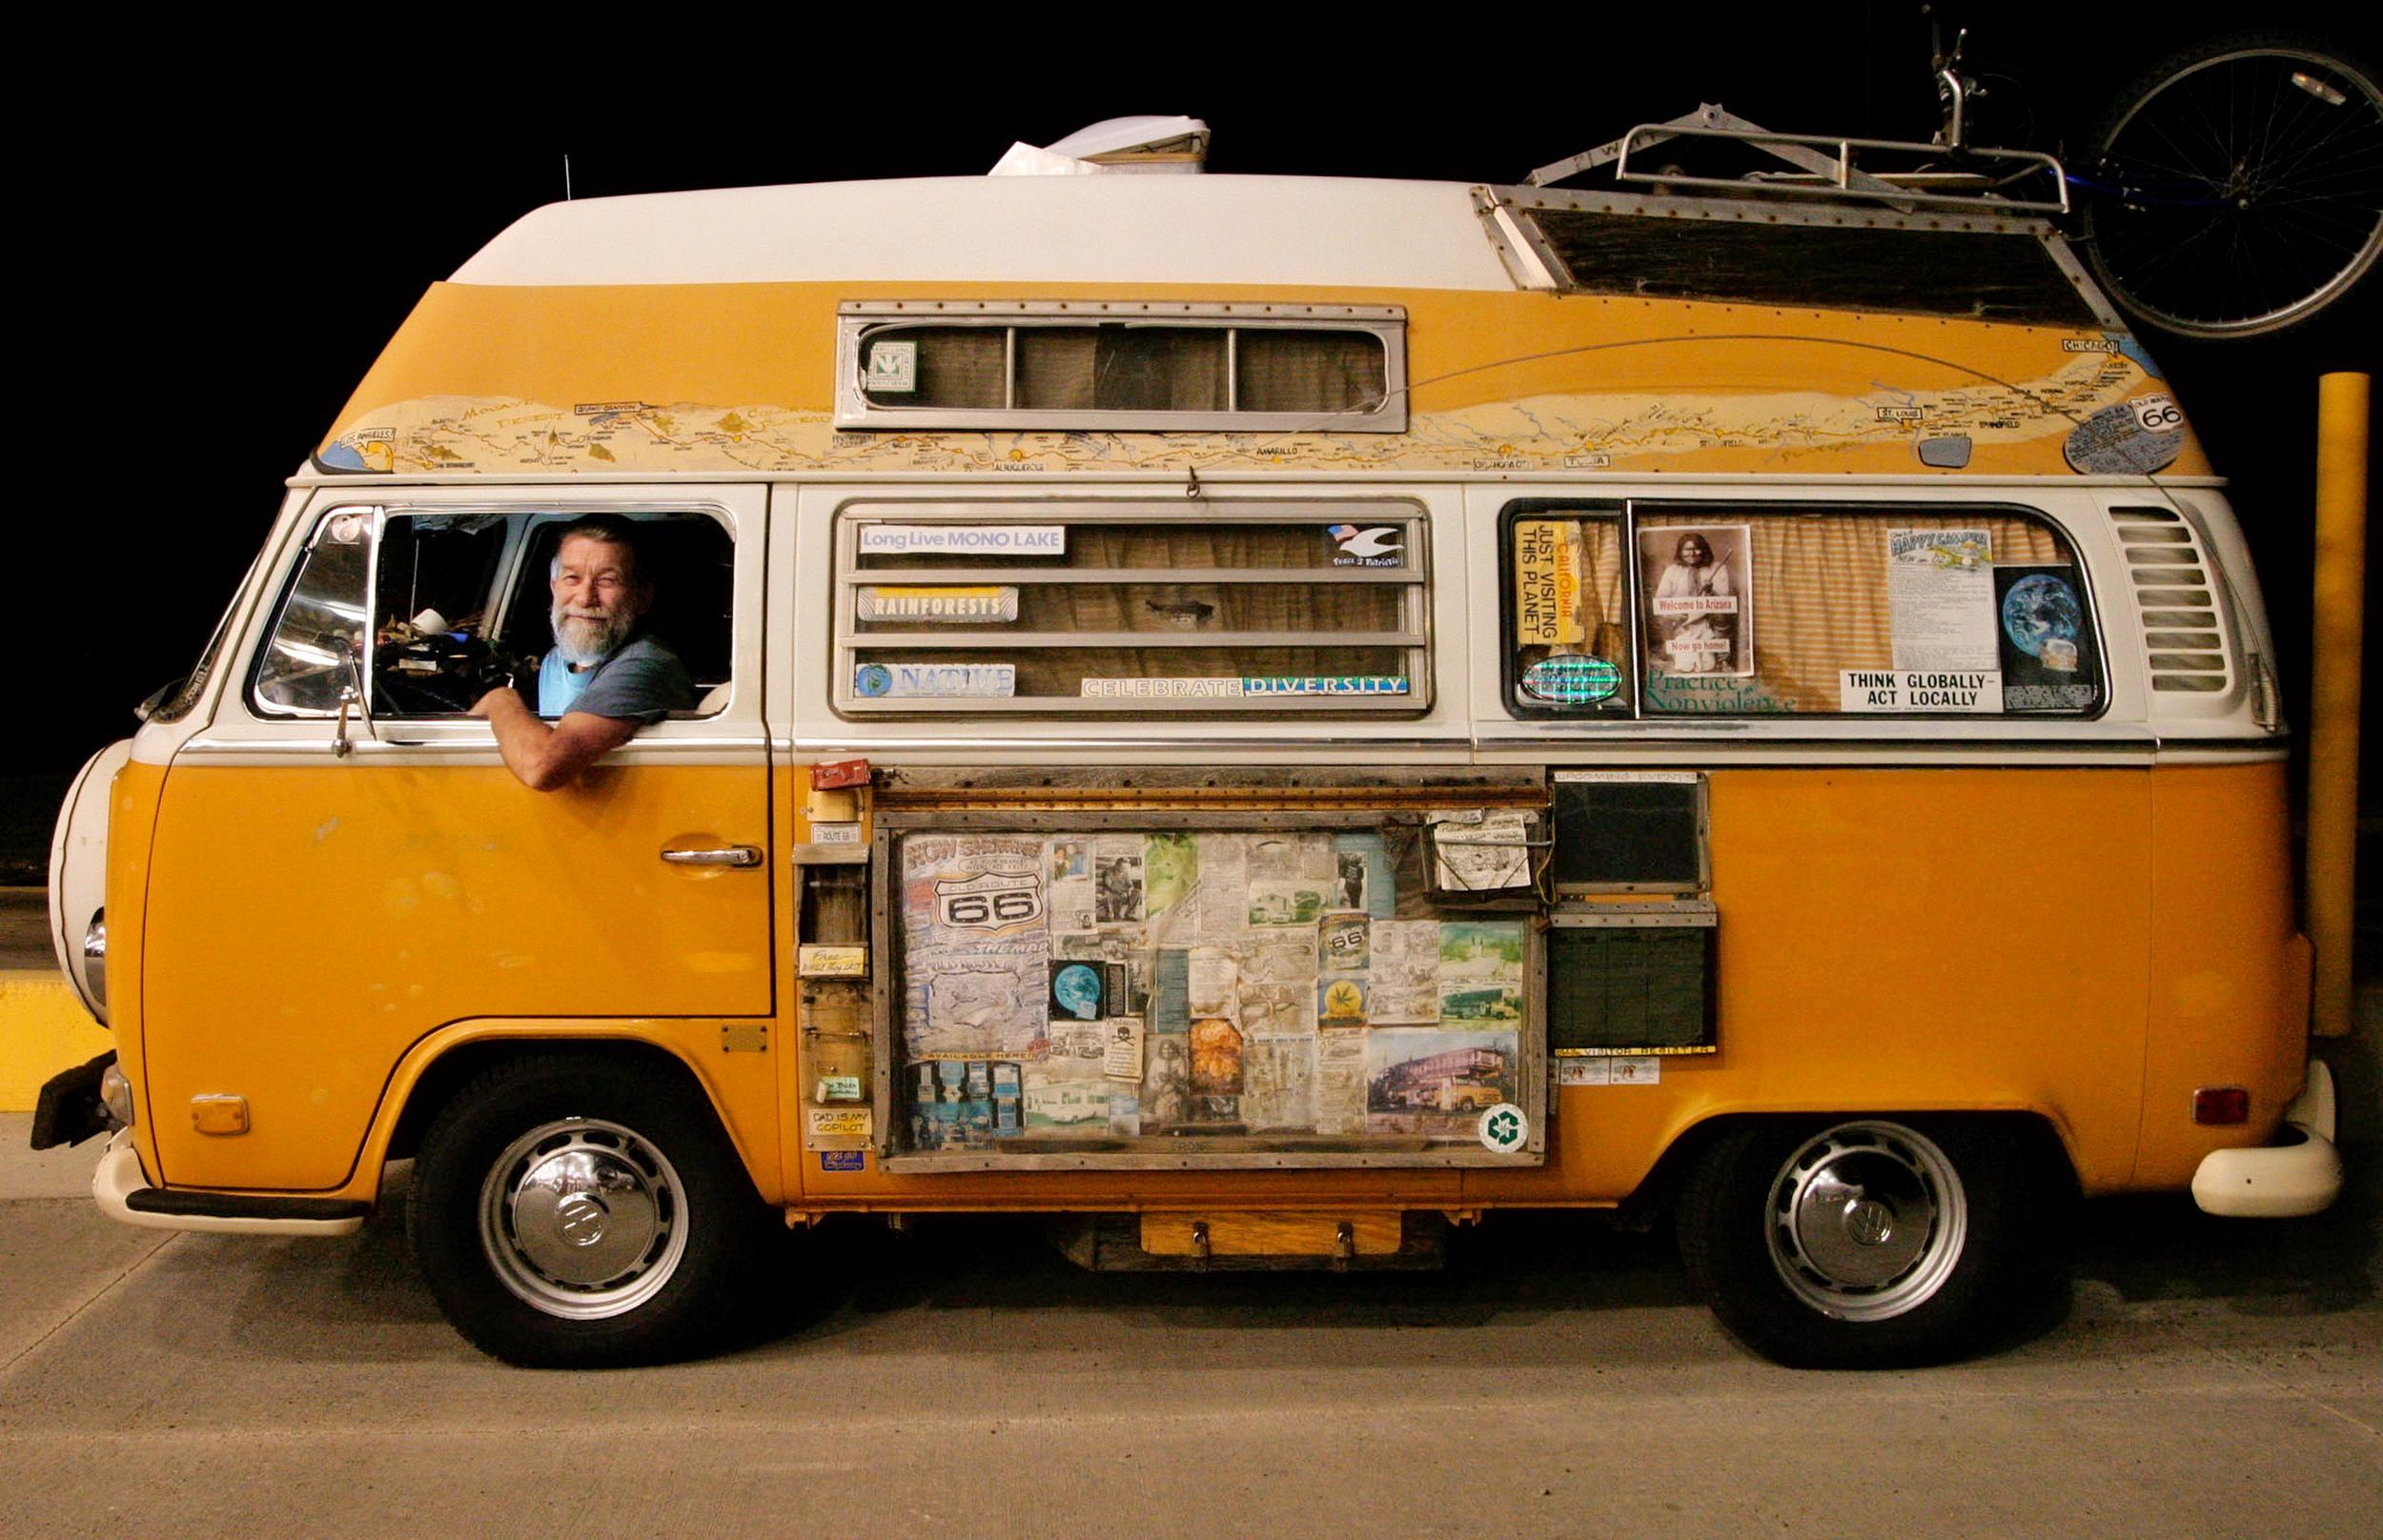 Robert Waldmire in his Route66 van at a truck stop in Lebanon, Missouri.